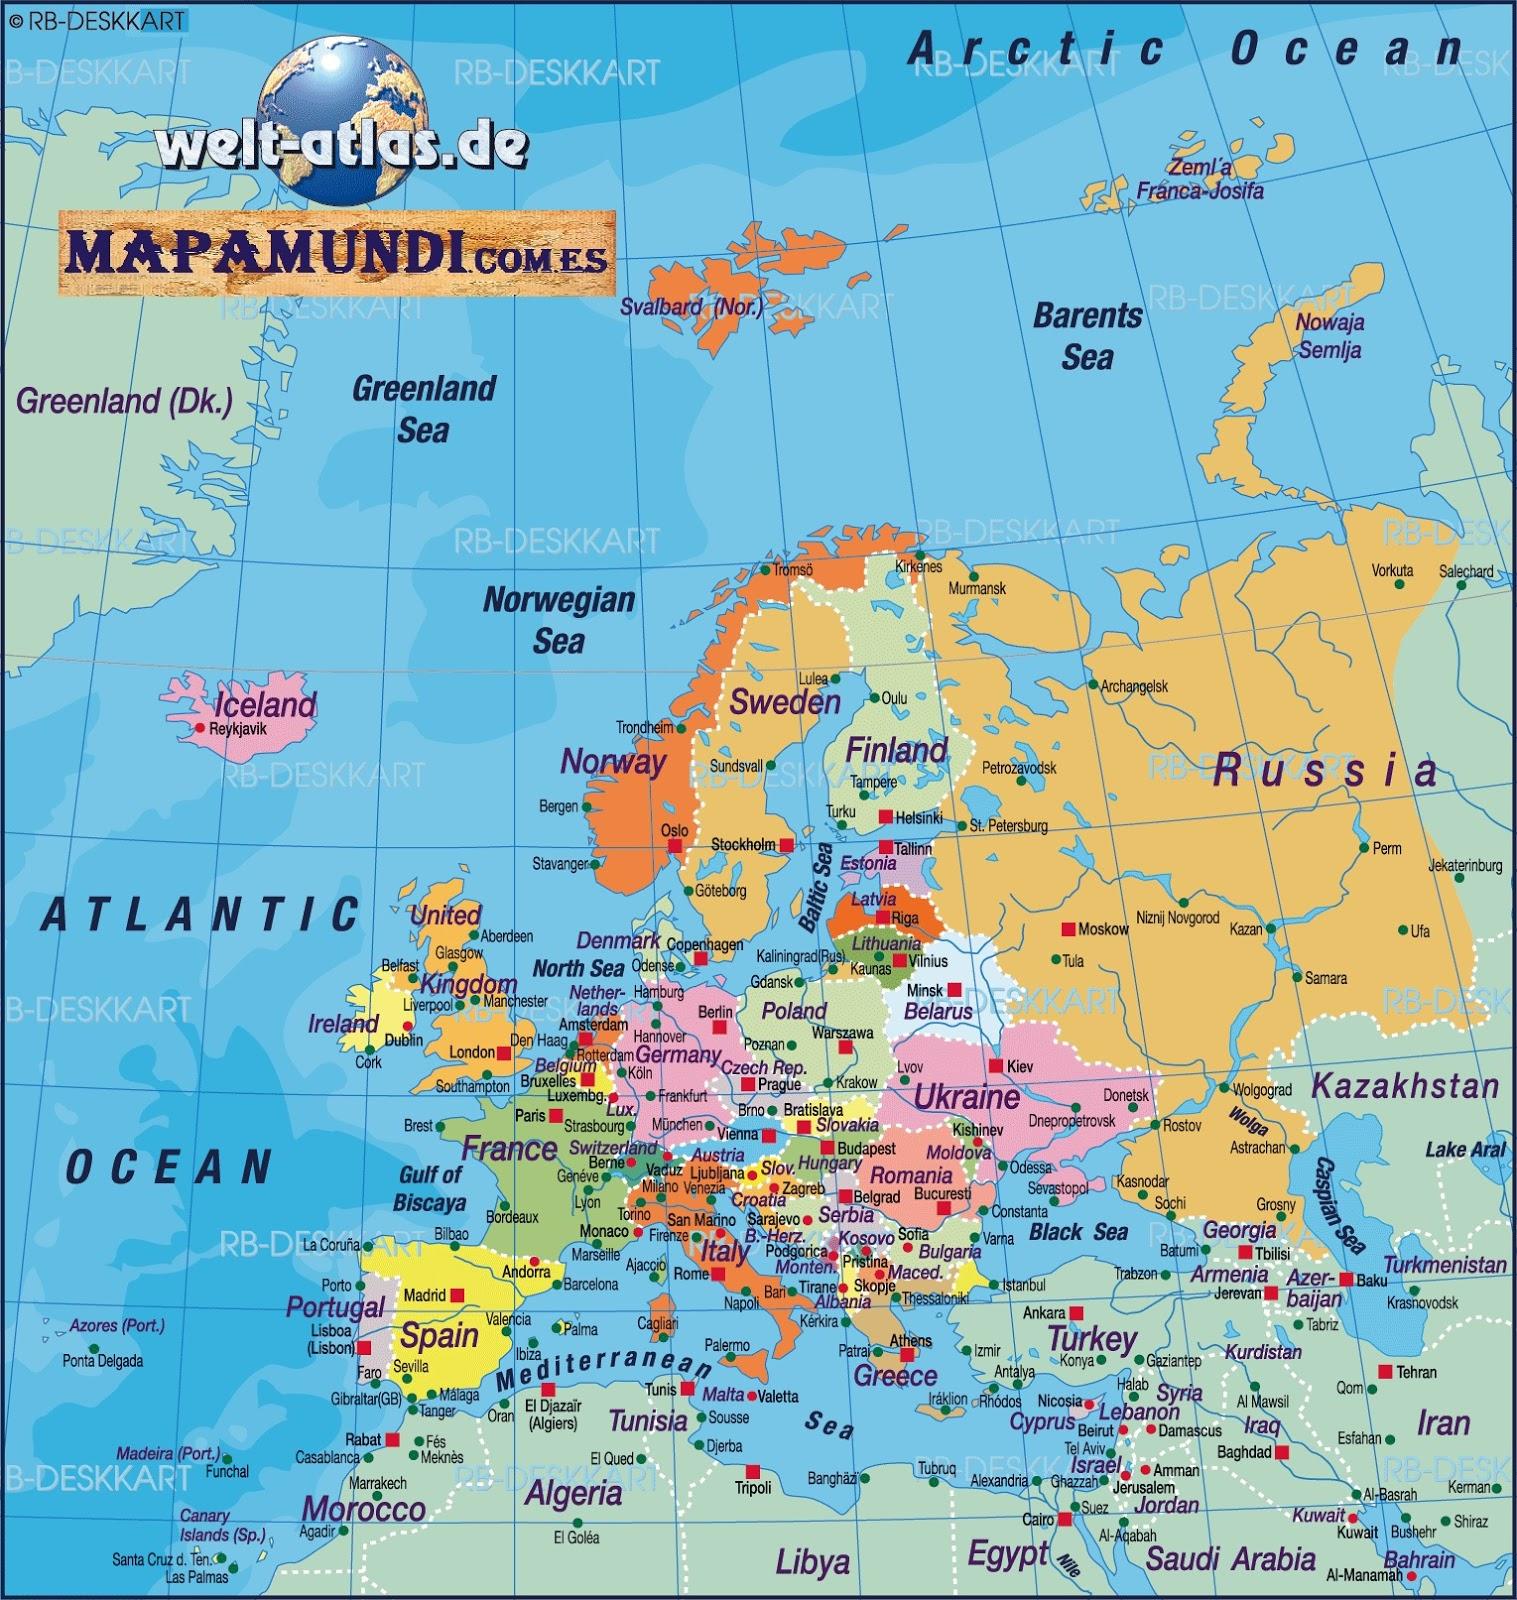 mapa mundi europa mapamundi | mapas del mundo y mucho más.: Mapamundi: Mapa de  mapa mundi europa